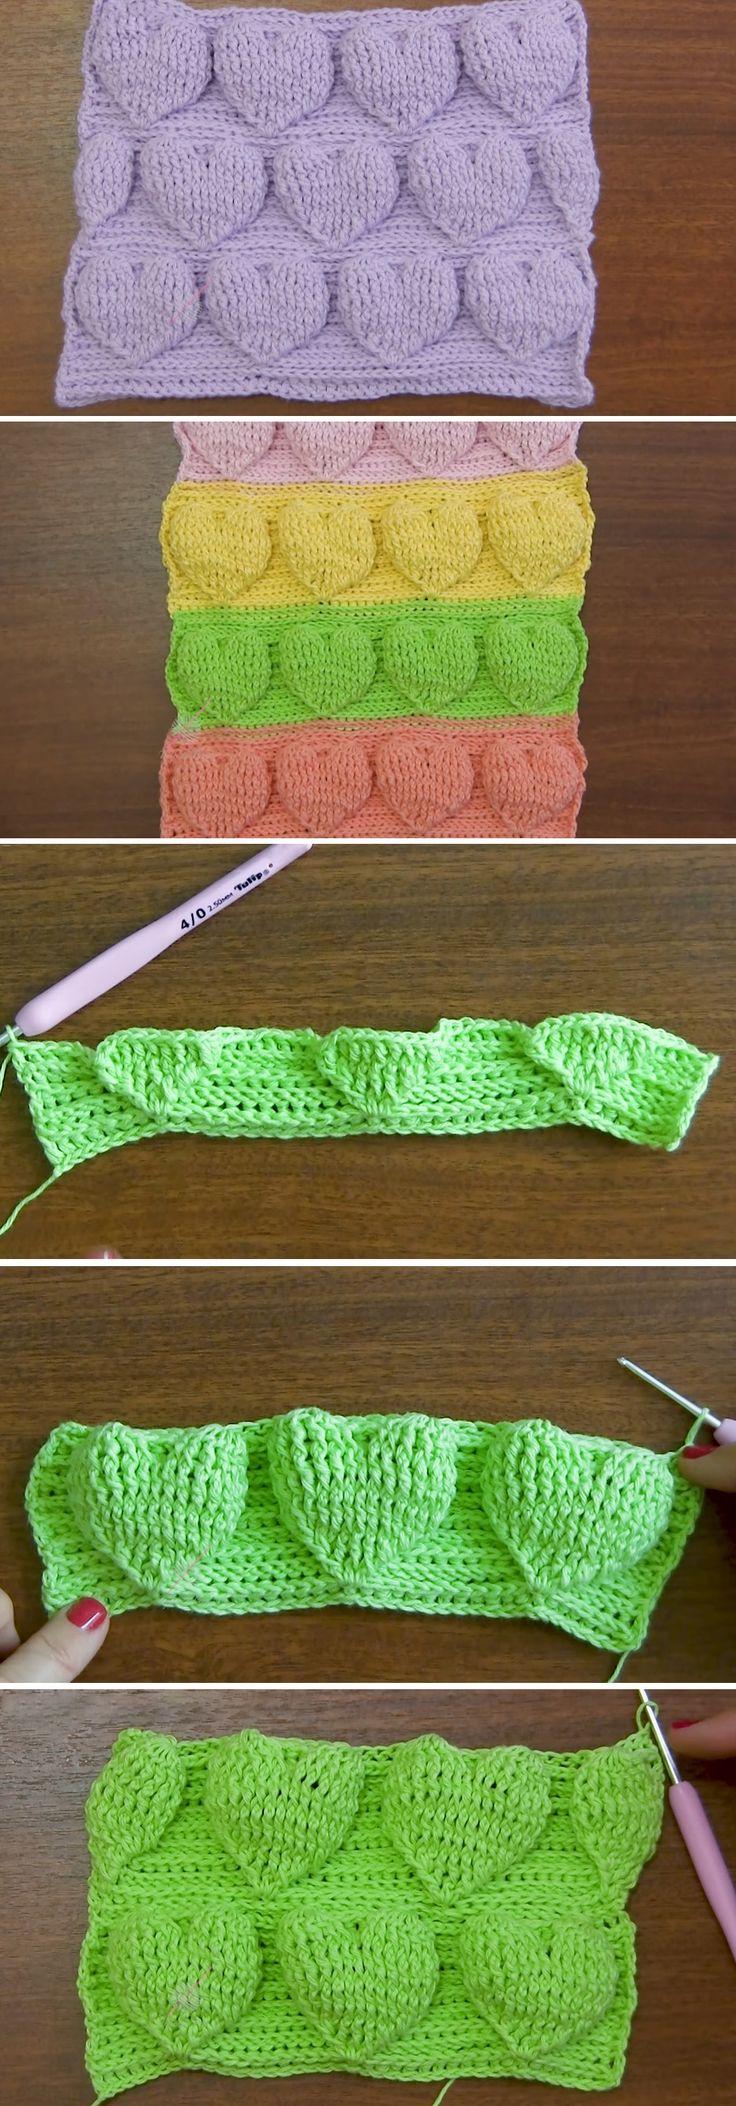 Crochet 3D Heart Tutorial #howtocrochet #freecrochetstitches #freecrochetpattern #crochetheartstitch